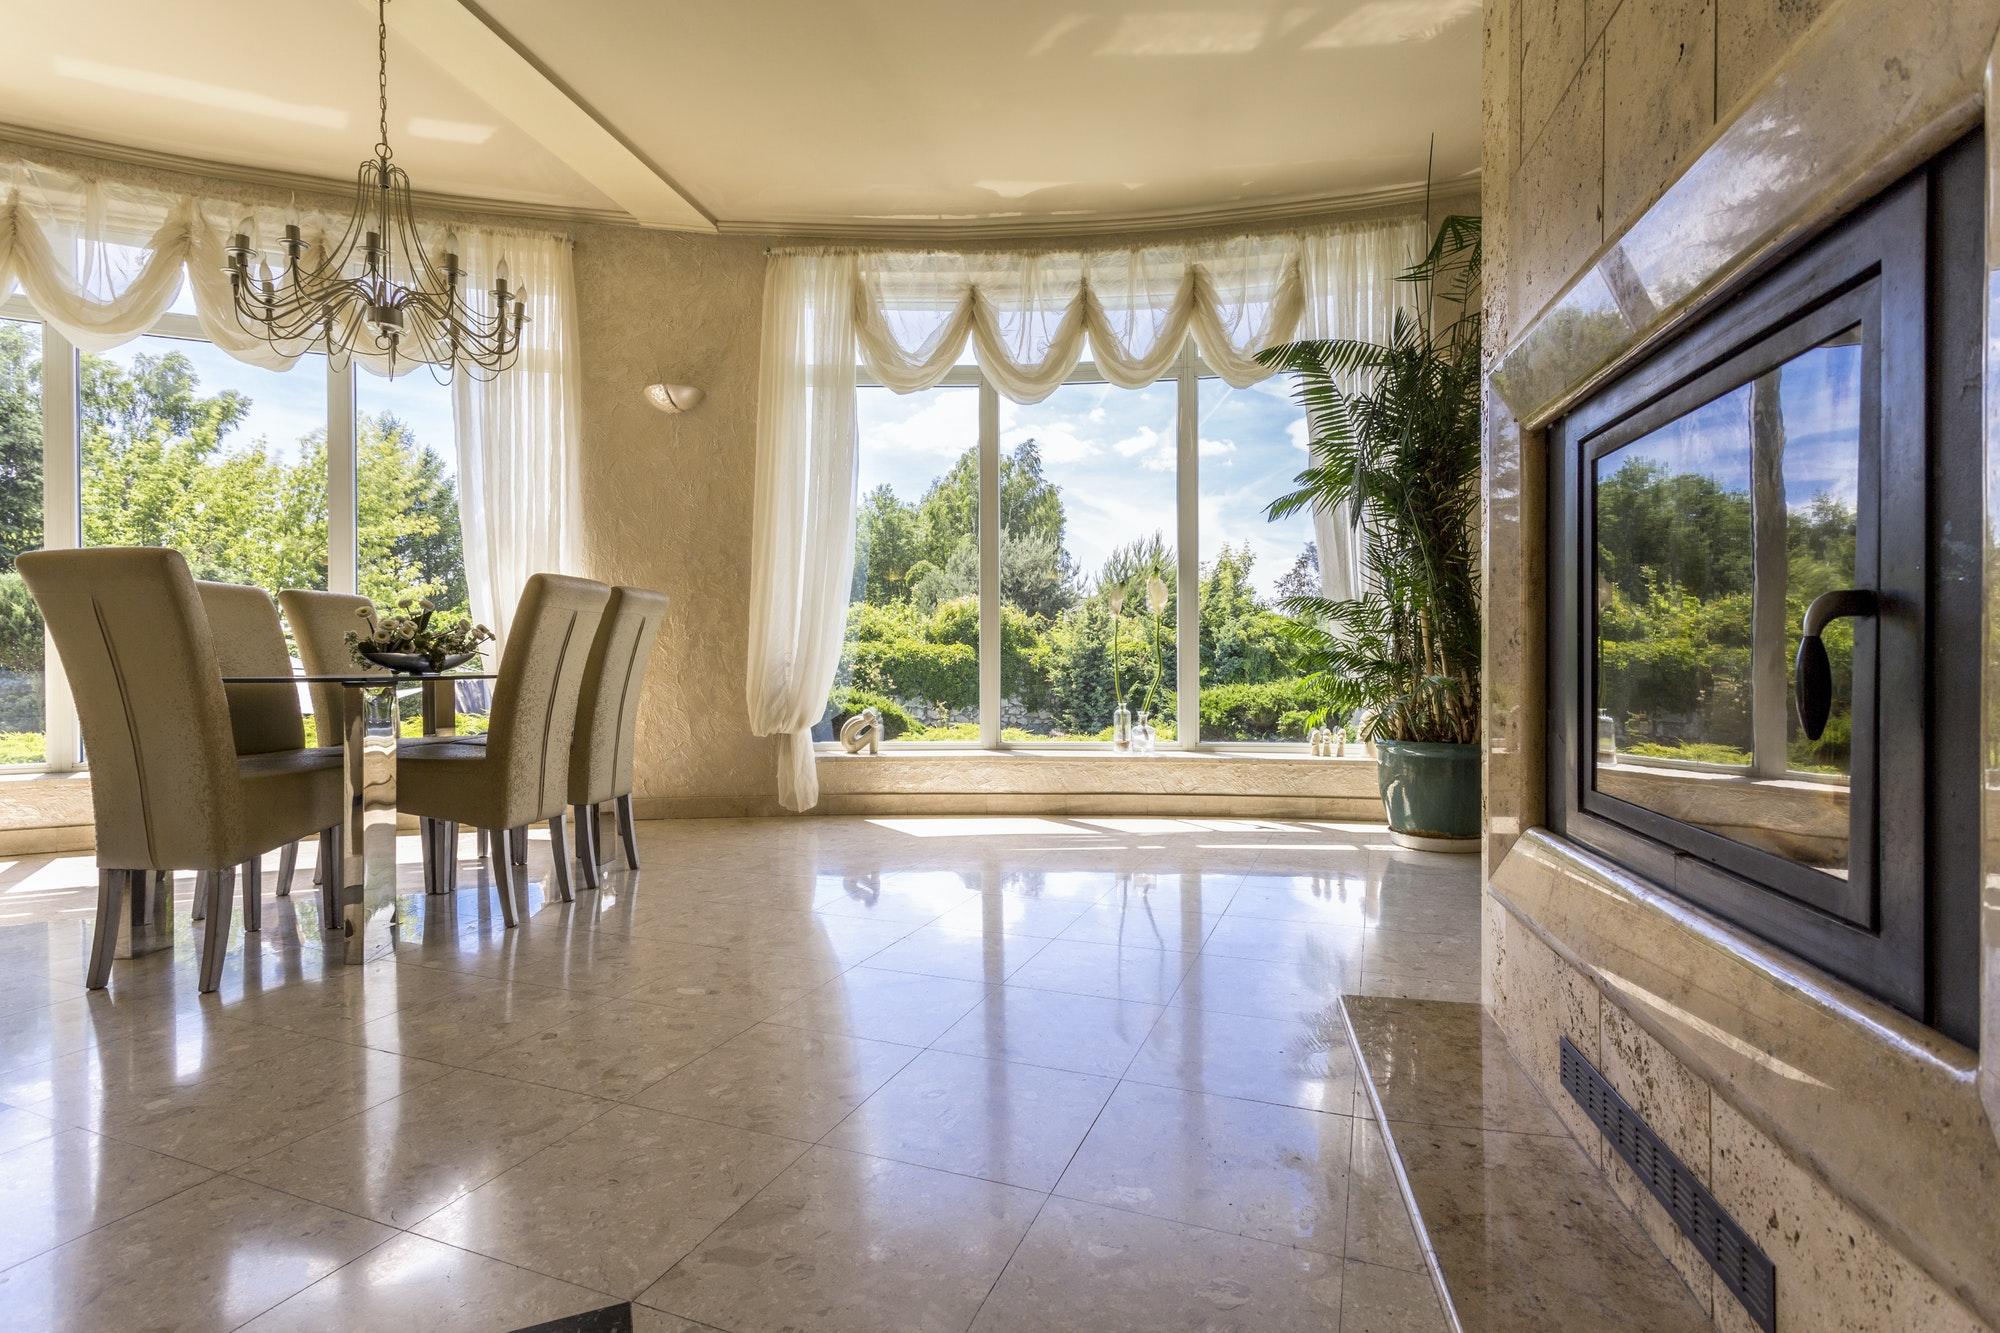 Spacious dinning room with windows